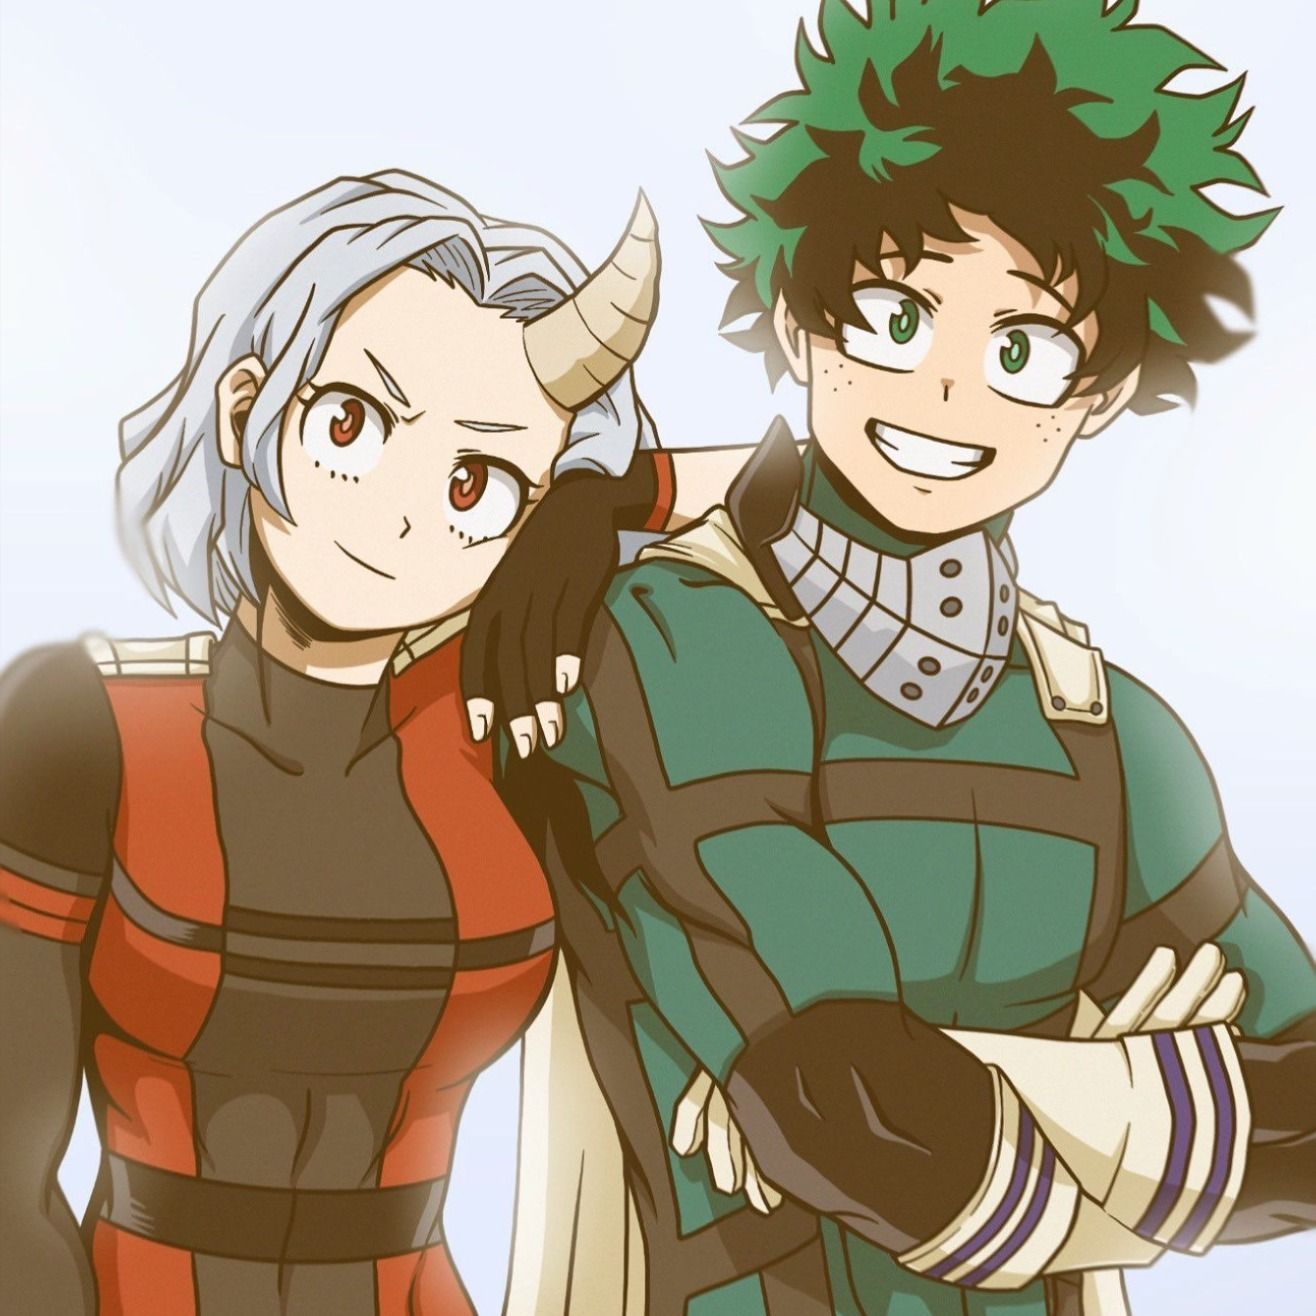 Eri And Deku All Grown Up My Hero Academia Episodes My Hero Academia Manga My Hero Academia Shouto